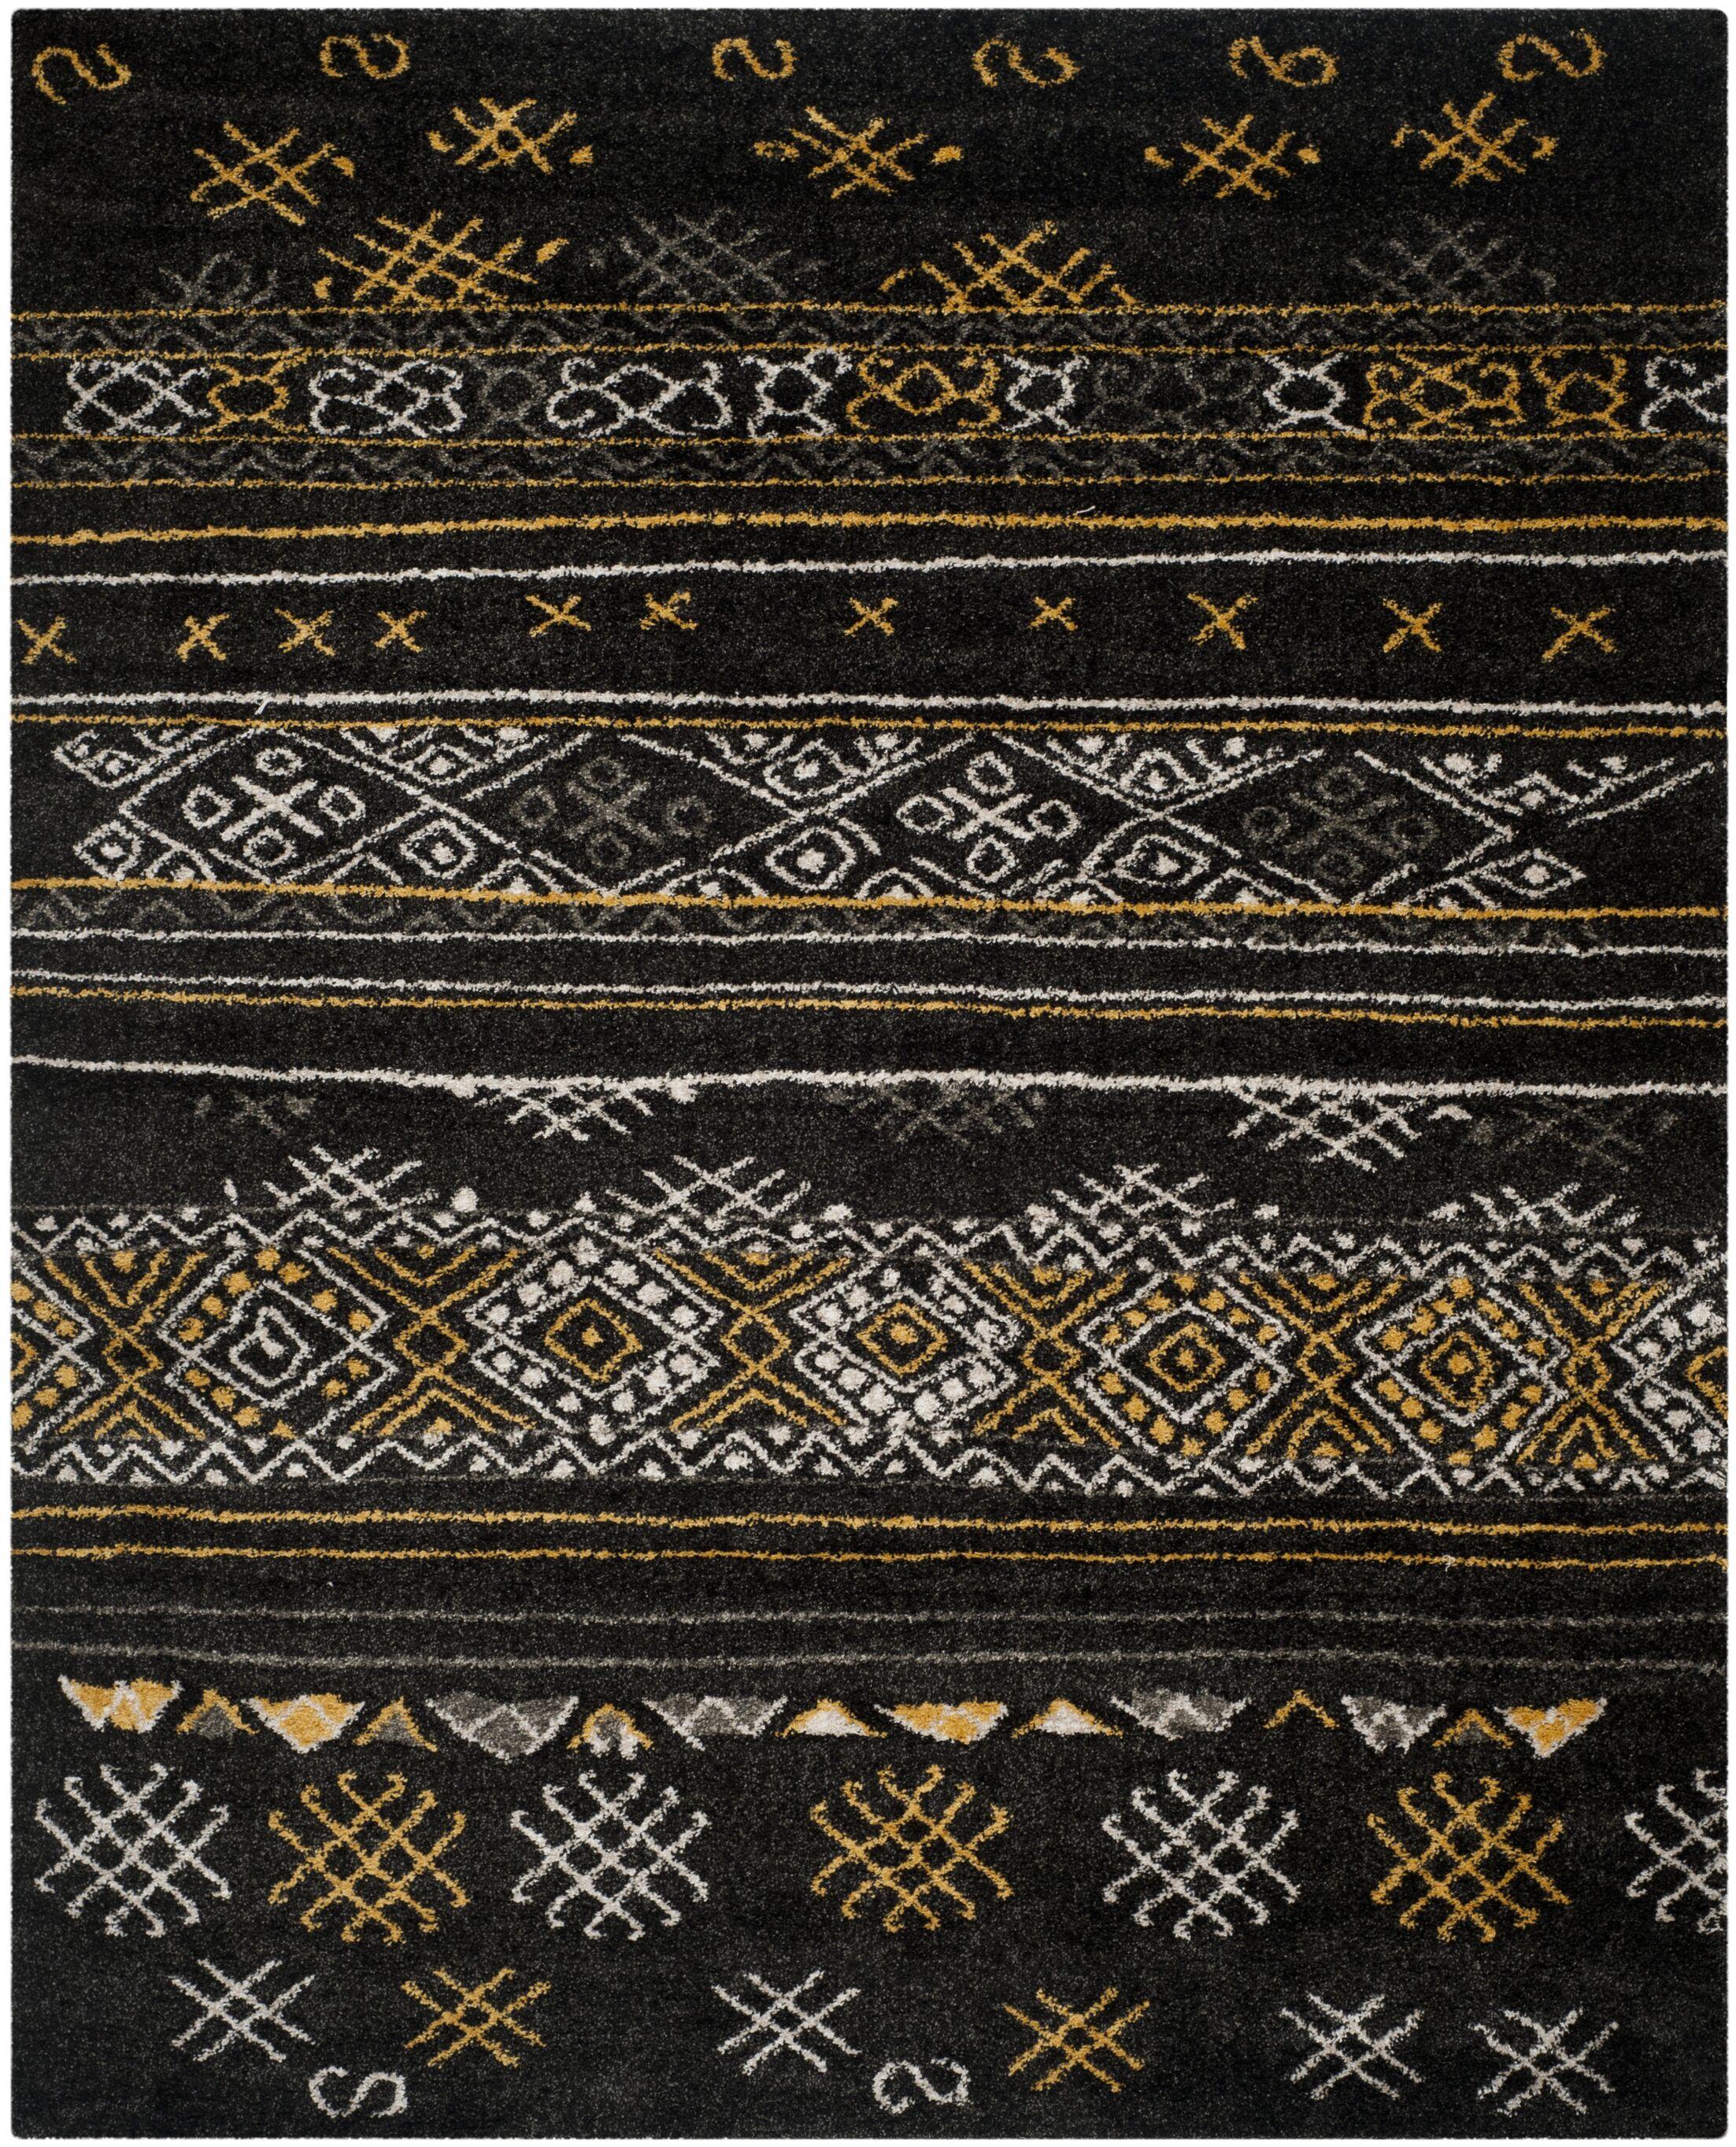 Tibetan Black/Gold Rug Rug Size: Rectangle 8' x 10'